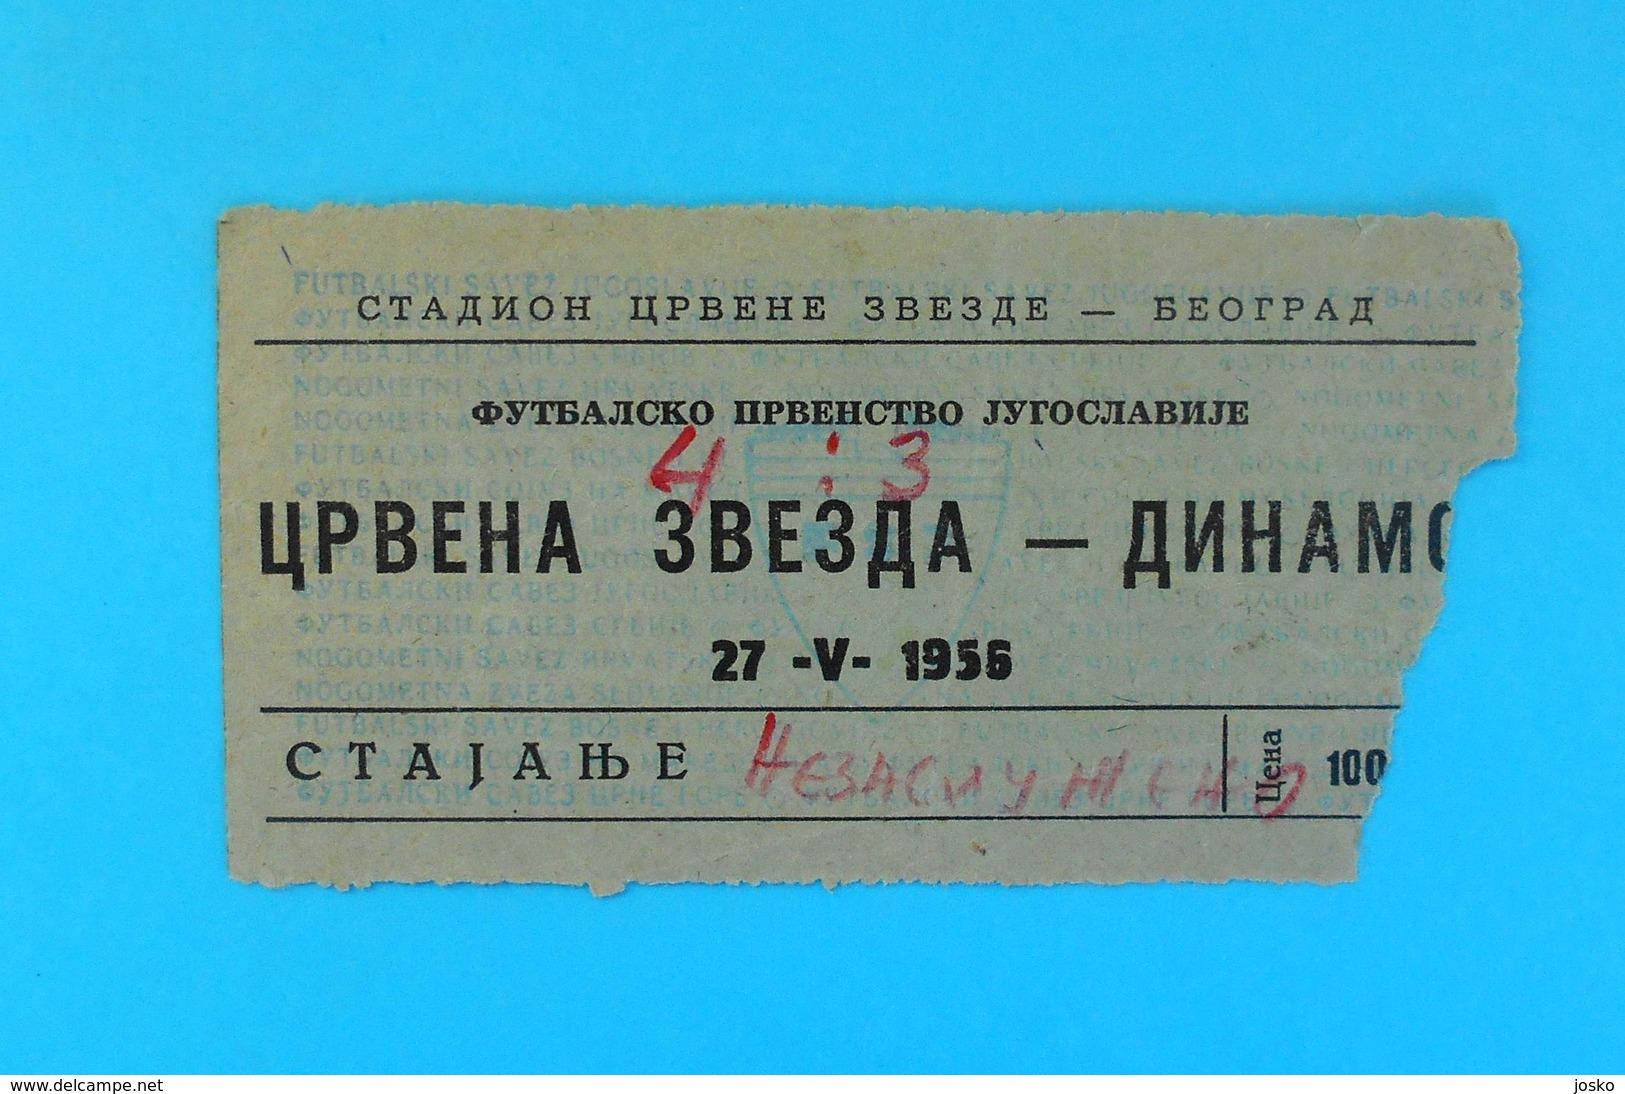 FK CRVENA ZVEZDA ( FC Red Star Belgrade ) Vs DINAMO Zagreb - 1956 Yugoslavia Premier League Football Match Ticket Soccer - Match Tickets